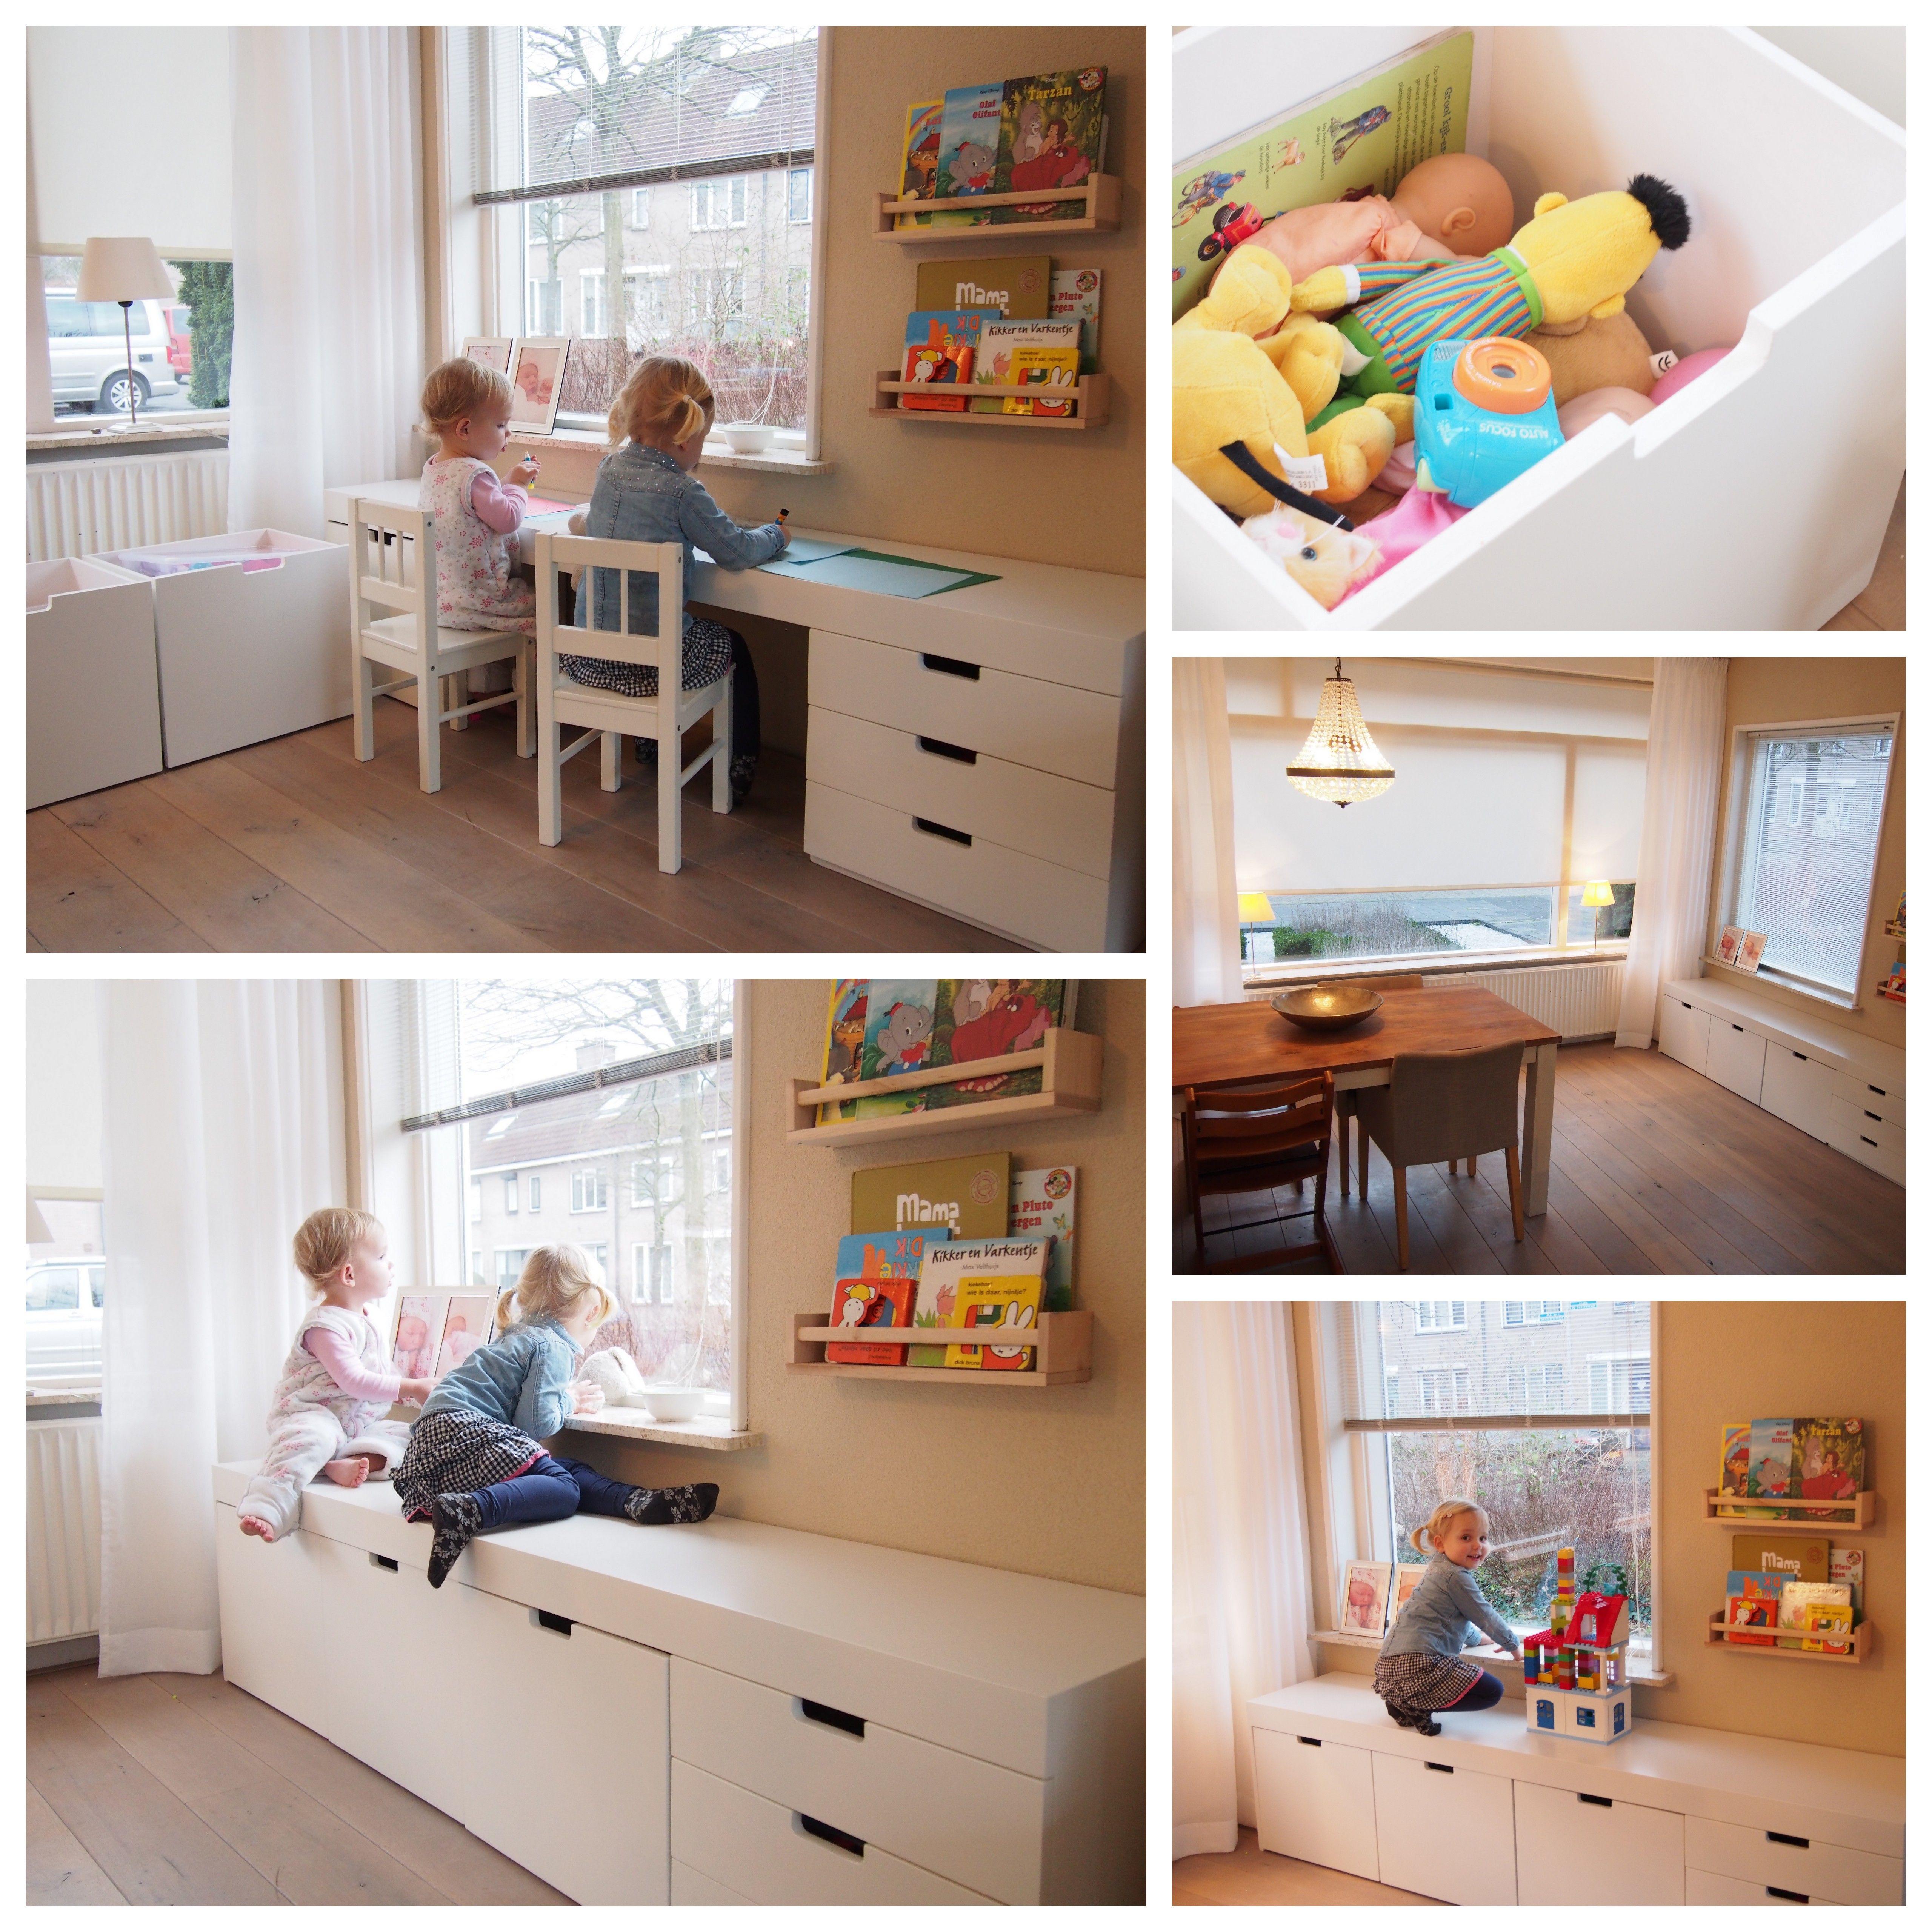 Multifunktionale kinderm bel kids love style pinterest kinderzimmer kinder zimmer und - Kleinkind zimmer junge ...